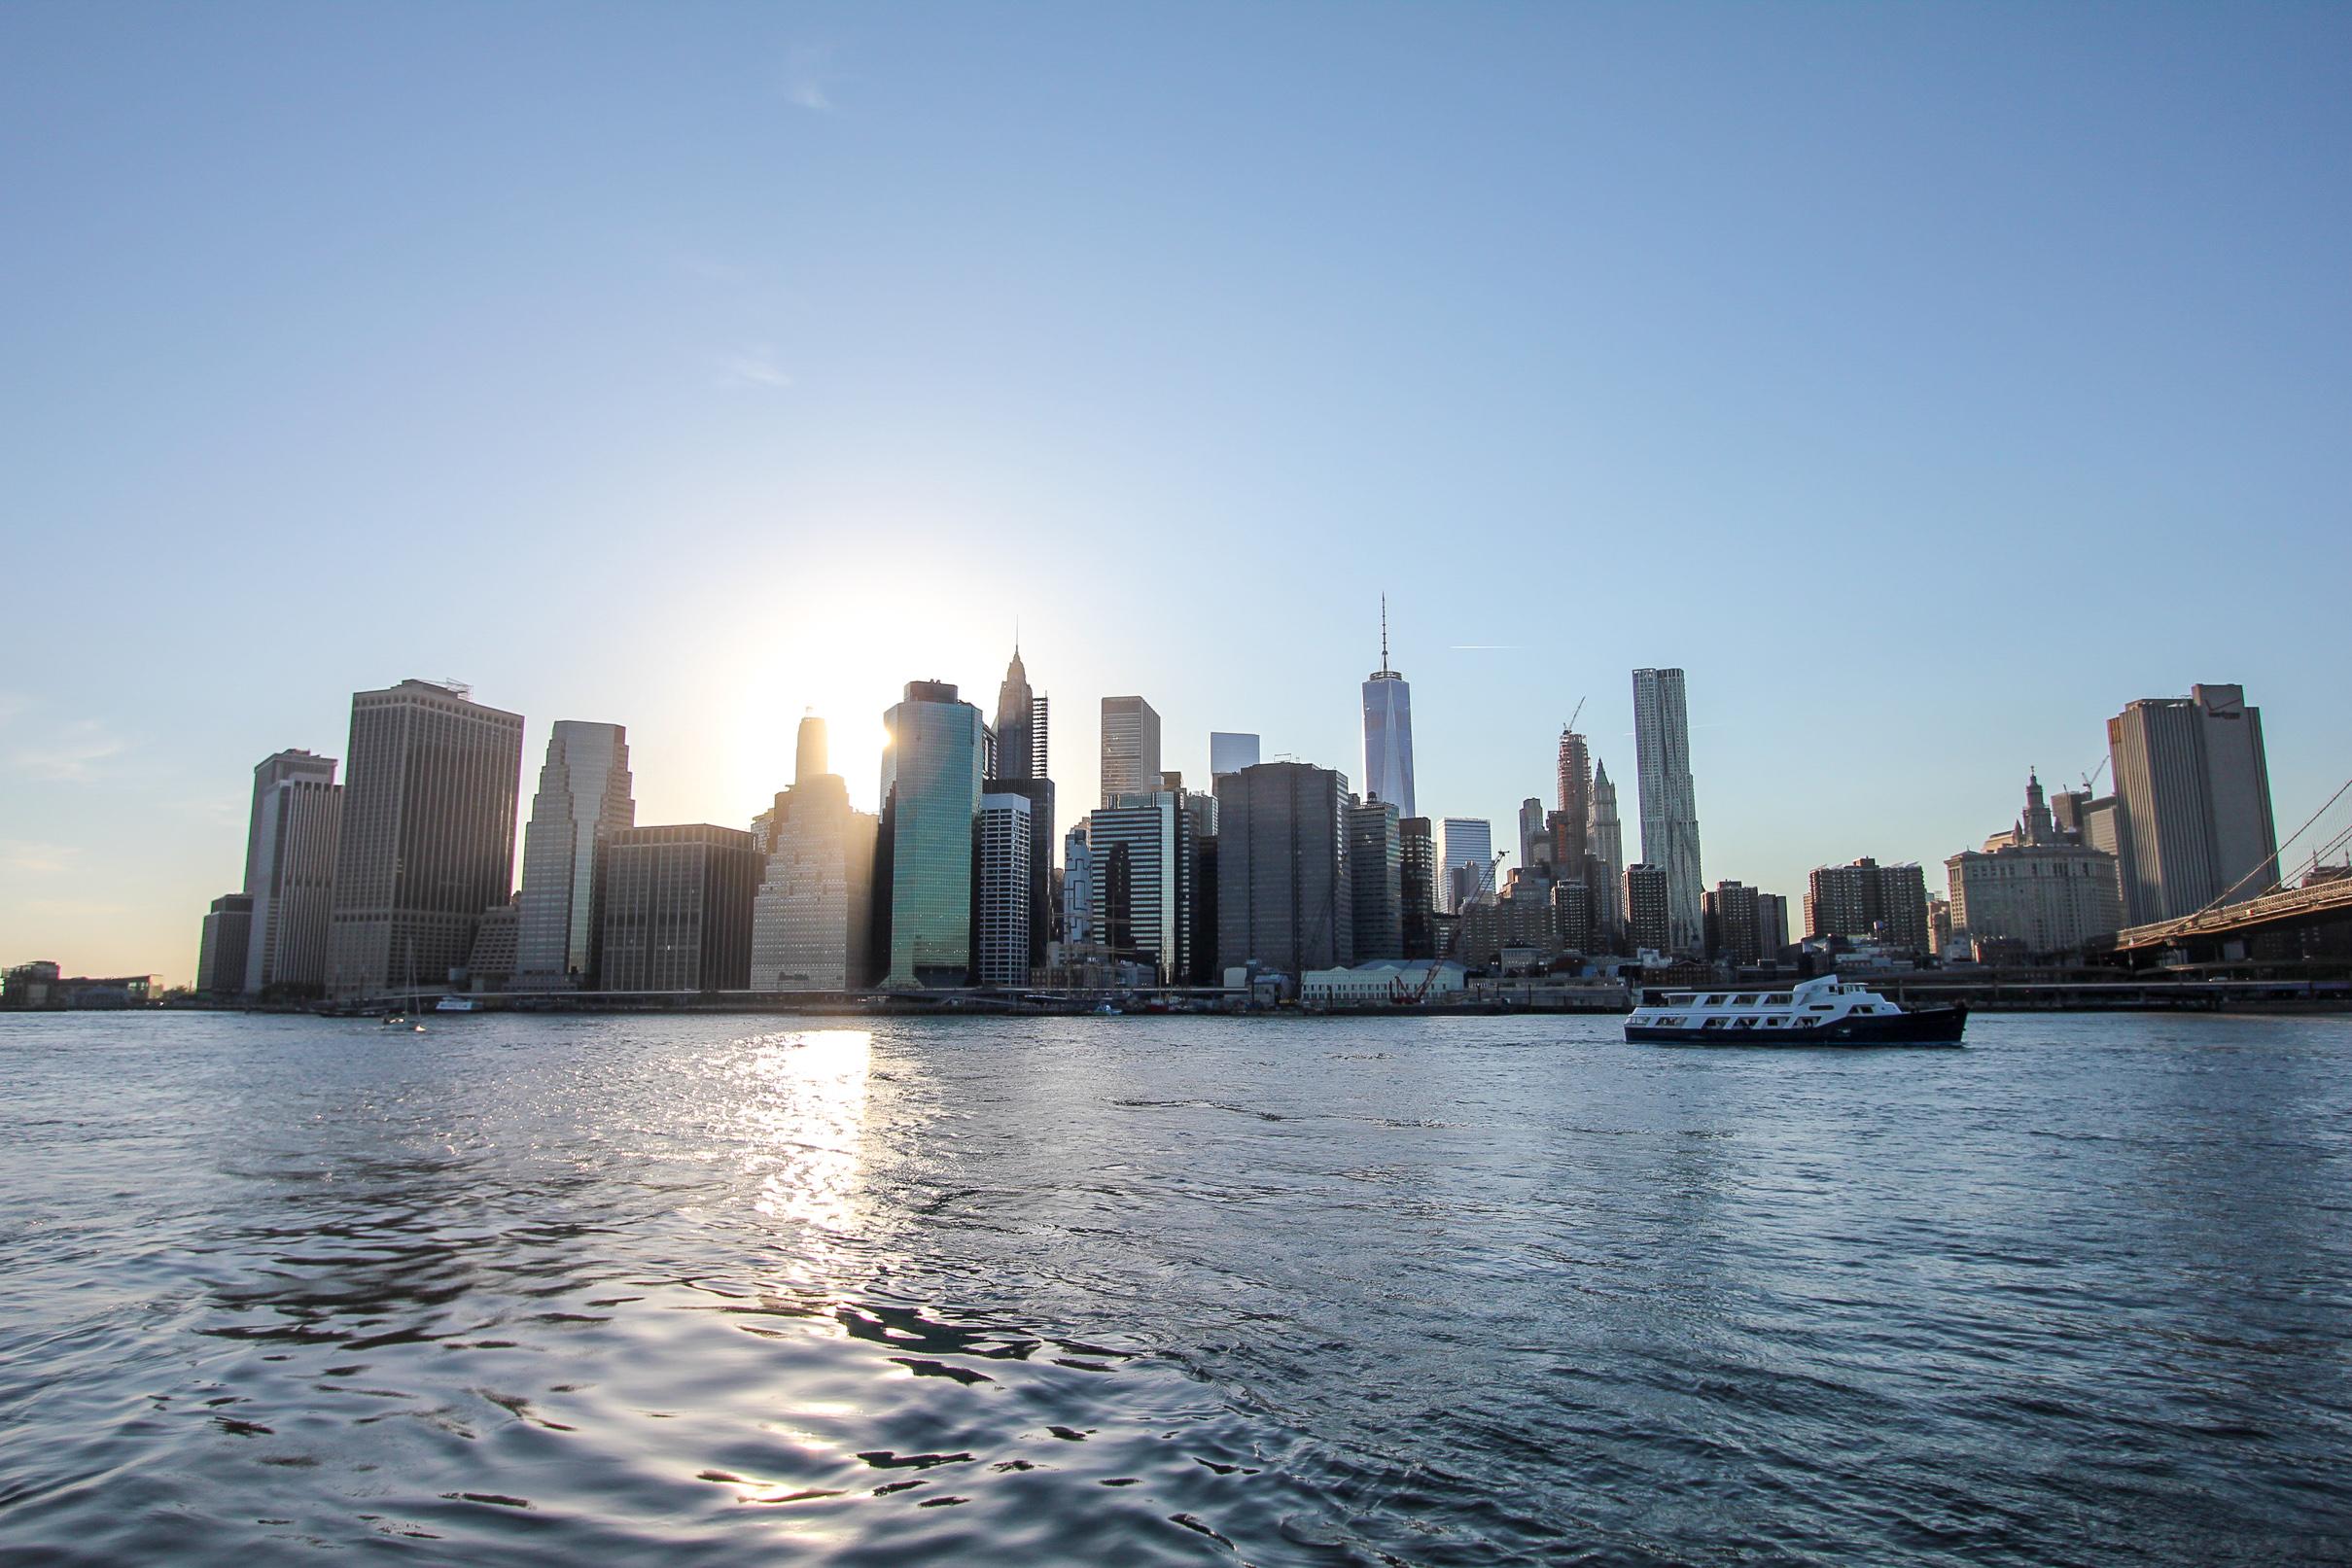 USA 2015: Good morning Manhattan